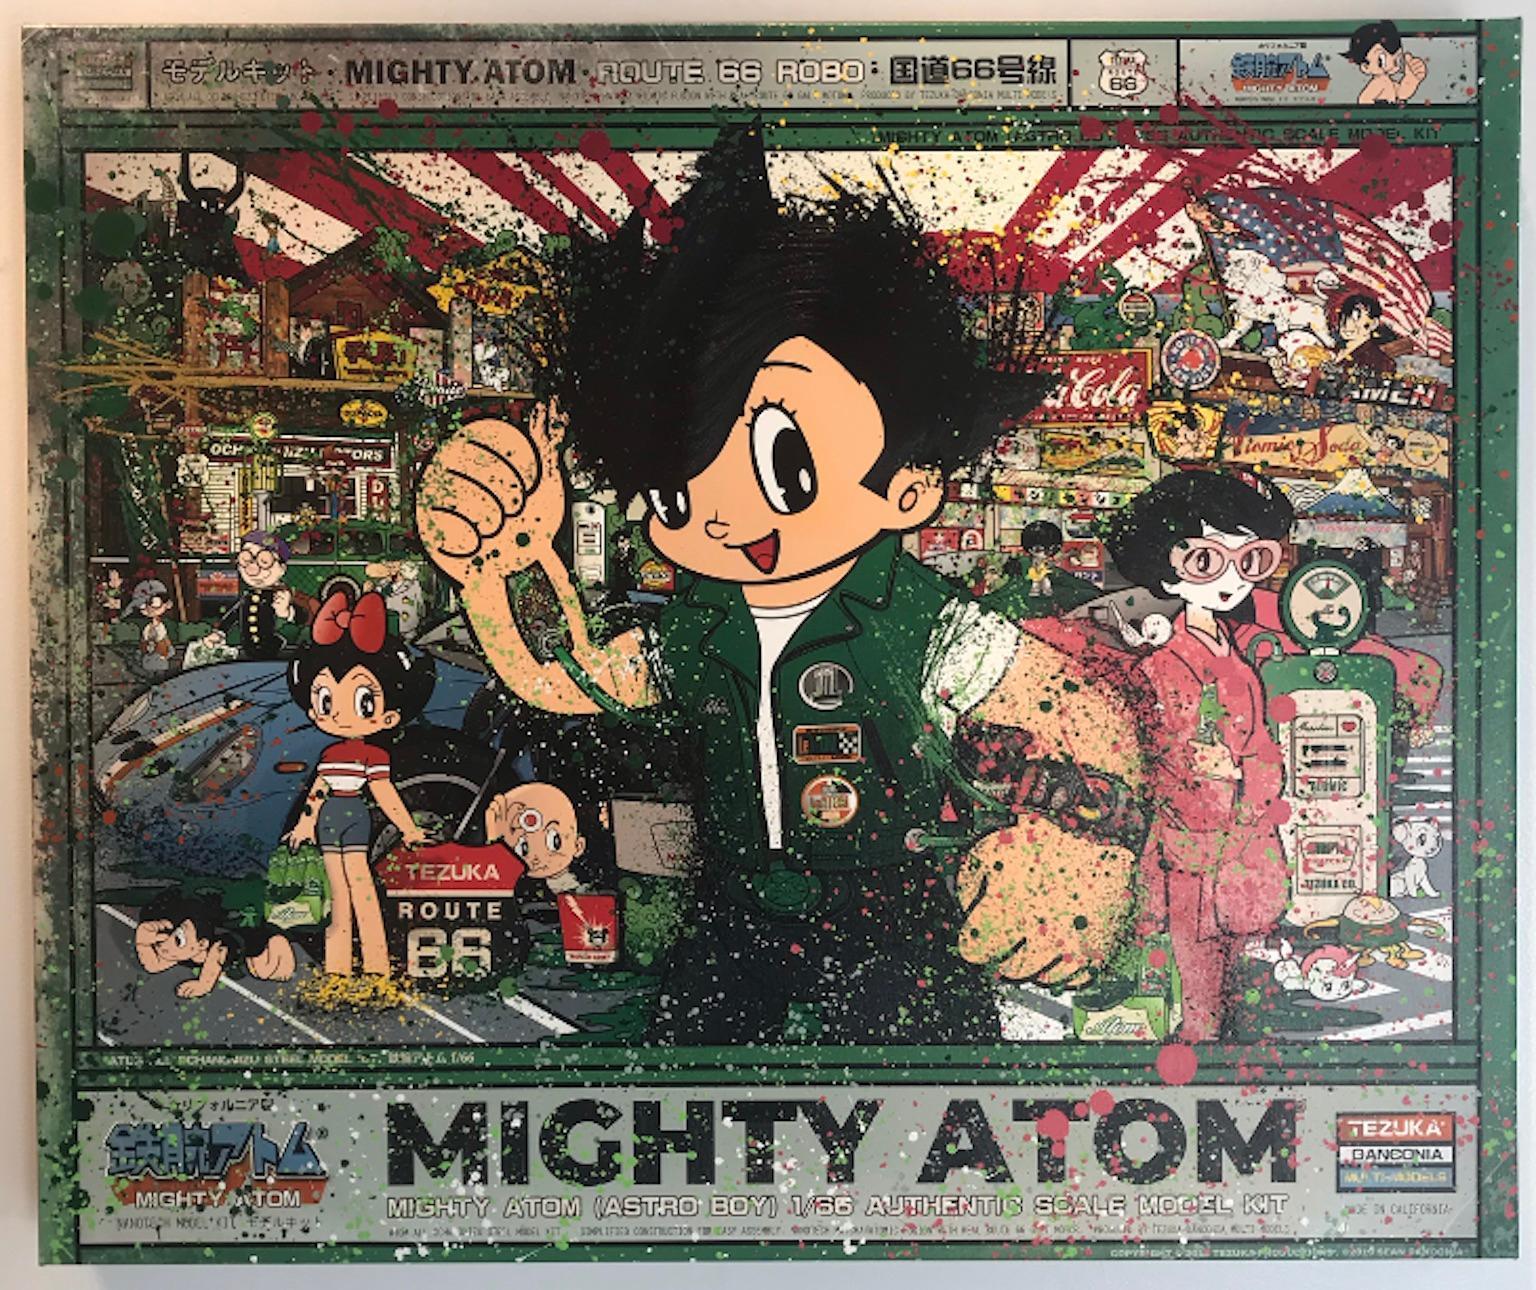 Astro Boy, Mighty Atom